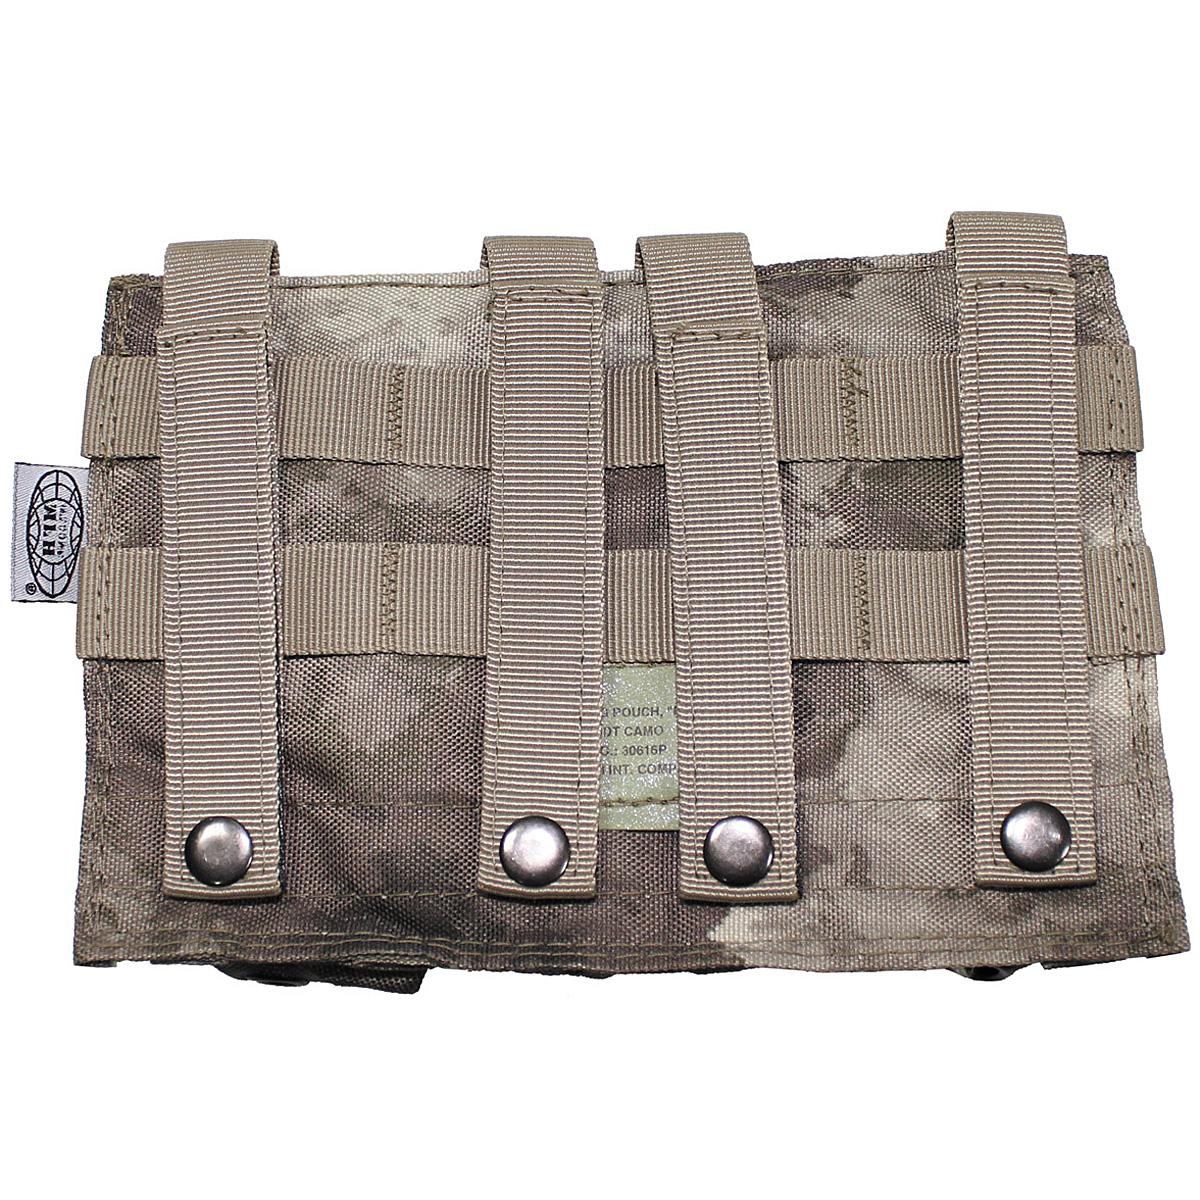 Poitrine sac Olive Couplage sac ceinture portefeuille sac